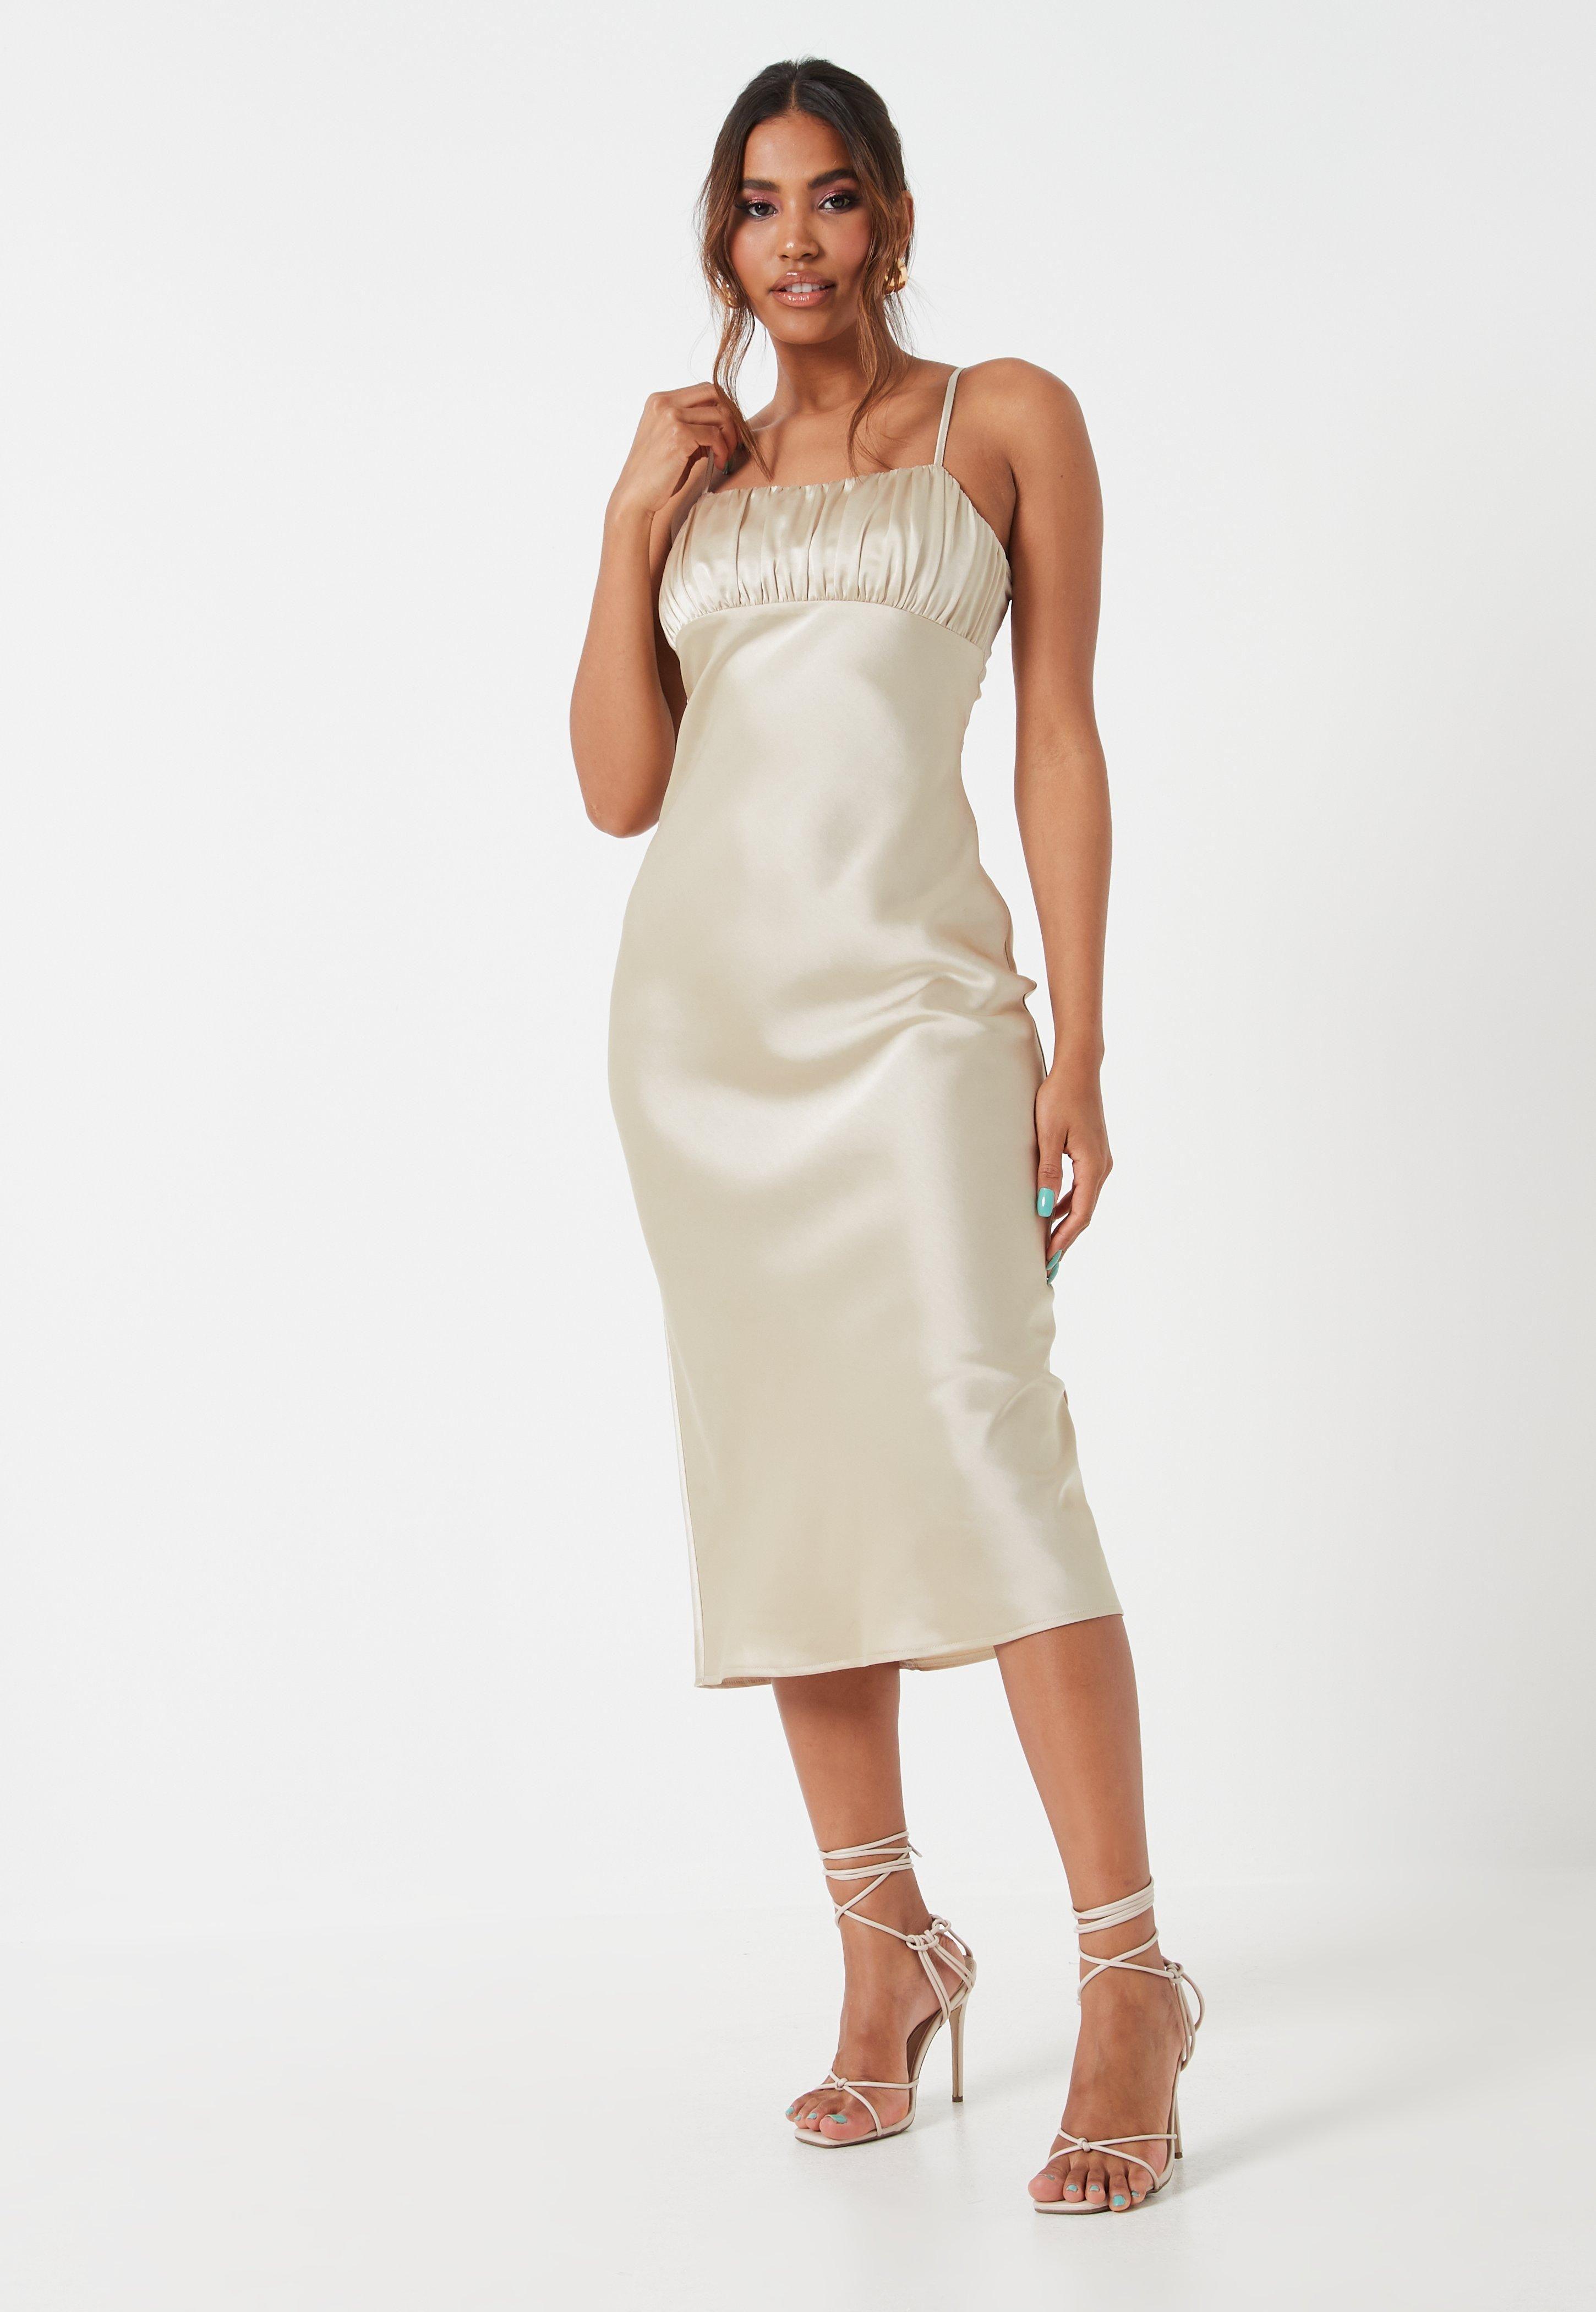 Cream Ruched Bust Strappy Midi Dress Sponsored Bust Aff Ruched Cream Strappy Midi Dress Trending Dresses Women Dress Online [ 4200 x 2900 Pixel ]